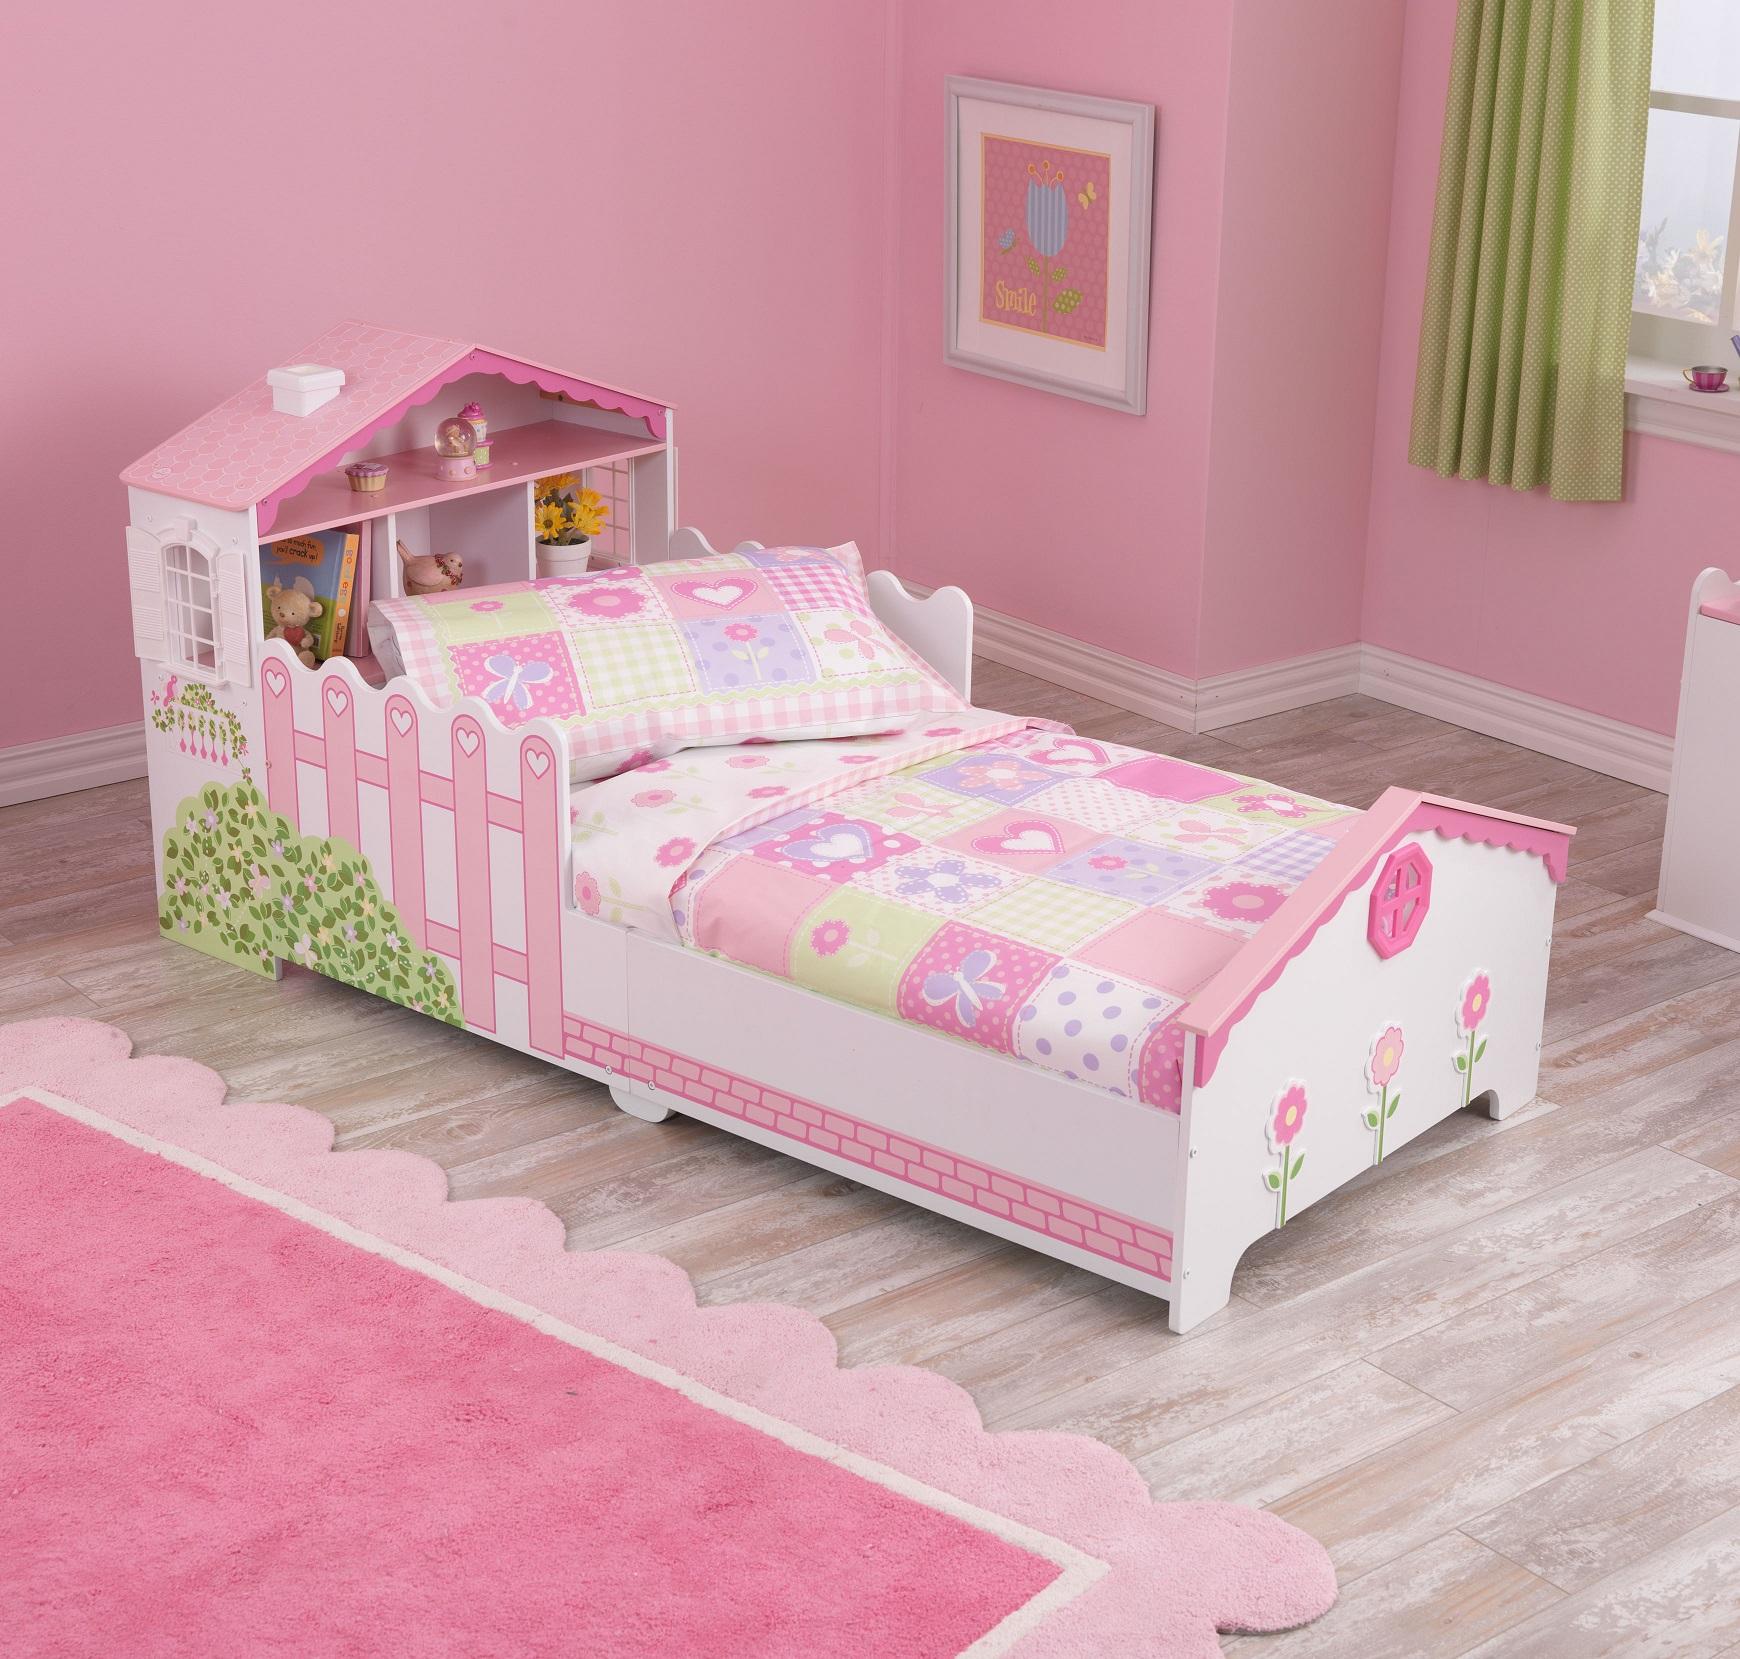 Dollhouse cottage barn sängkläder